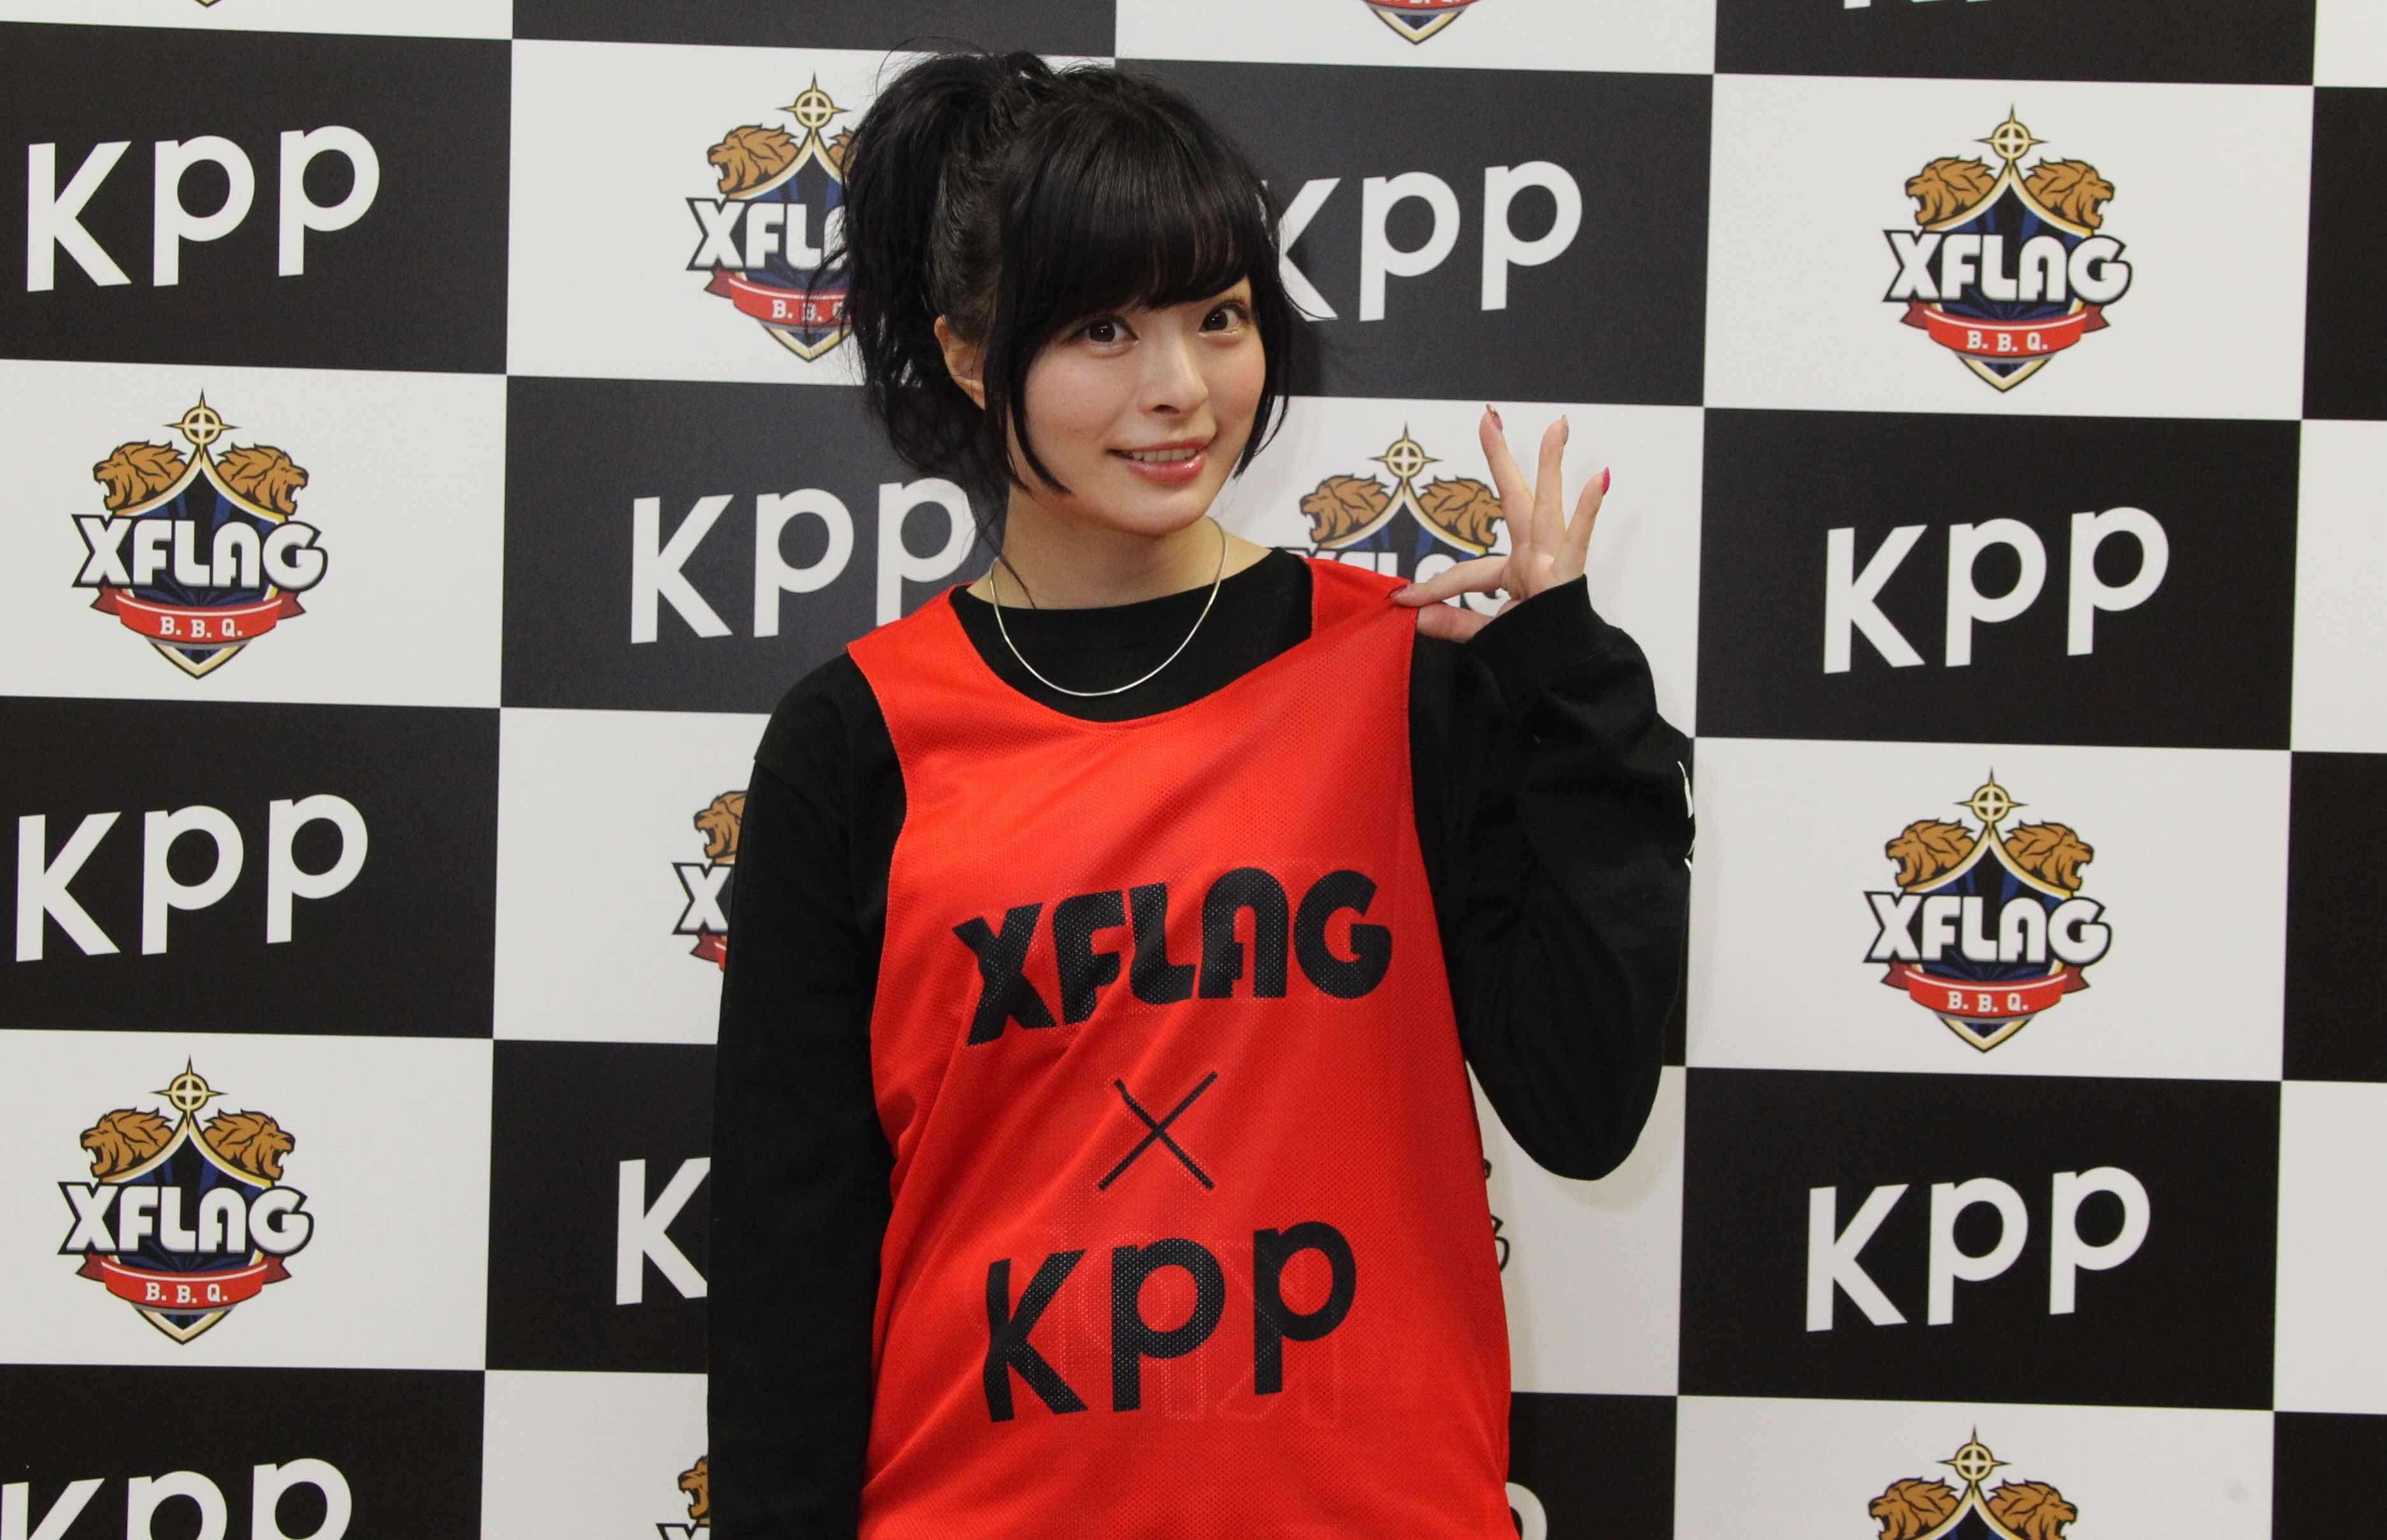 卡莉怪妞 就任「XFLAG Entertainment Partner」 卡莉怪妞、